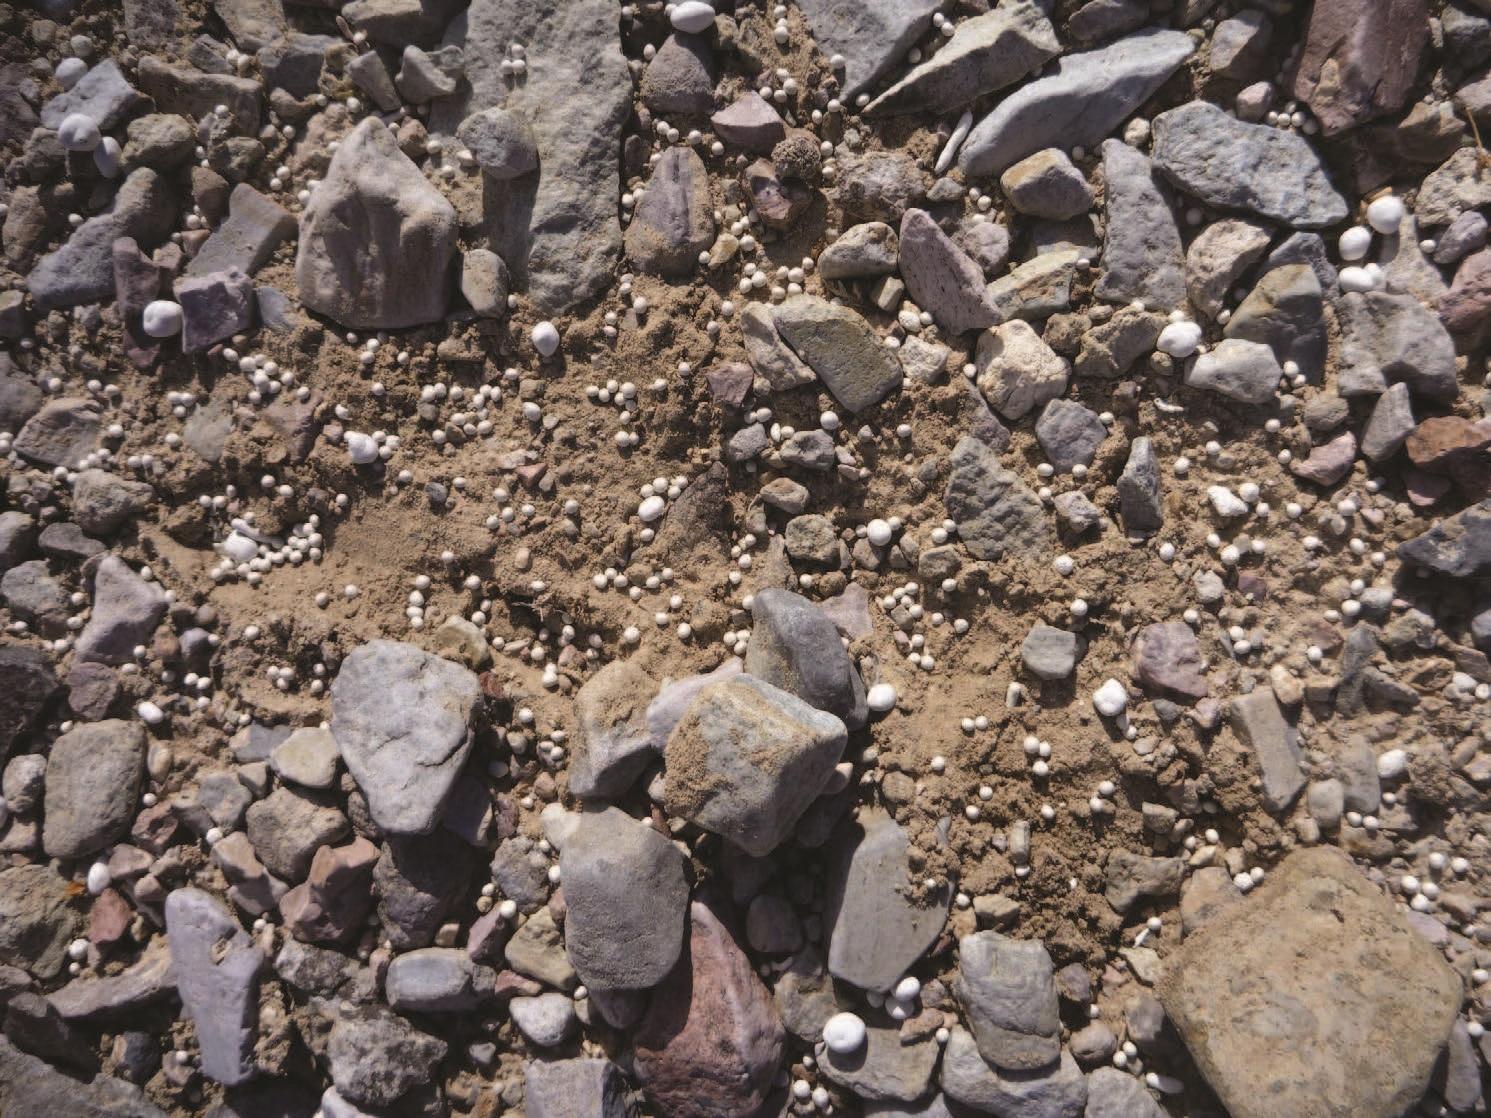 Small bits of pelletized steel amidst desert rocks and dirt.